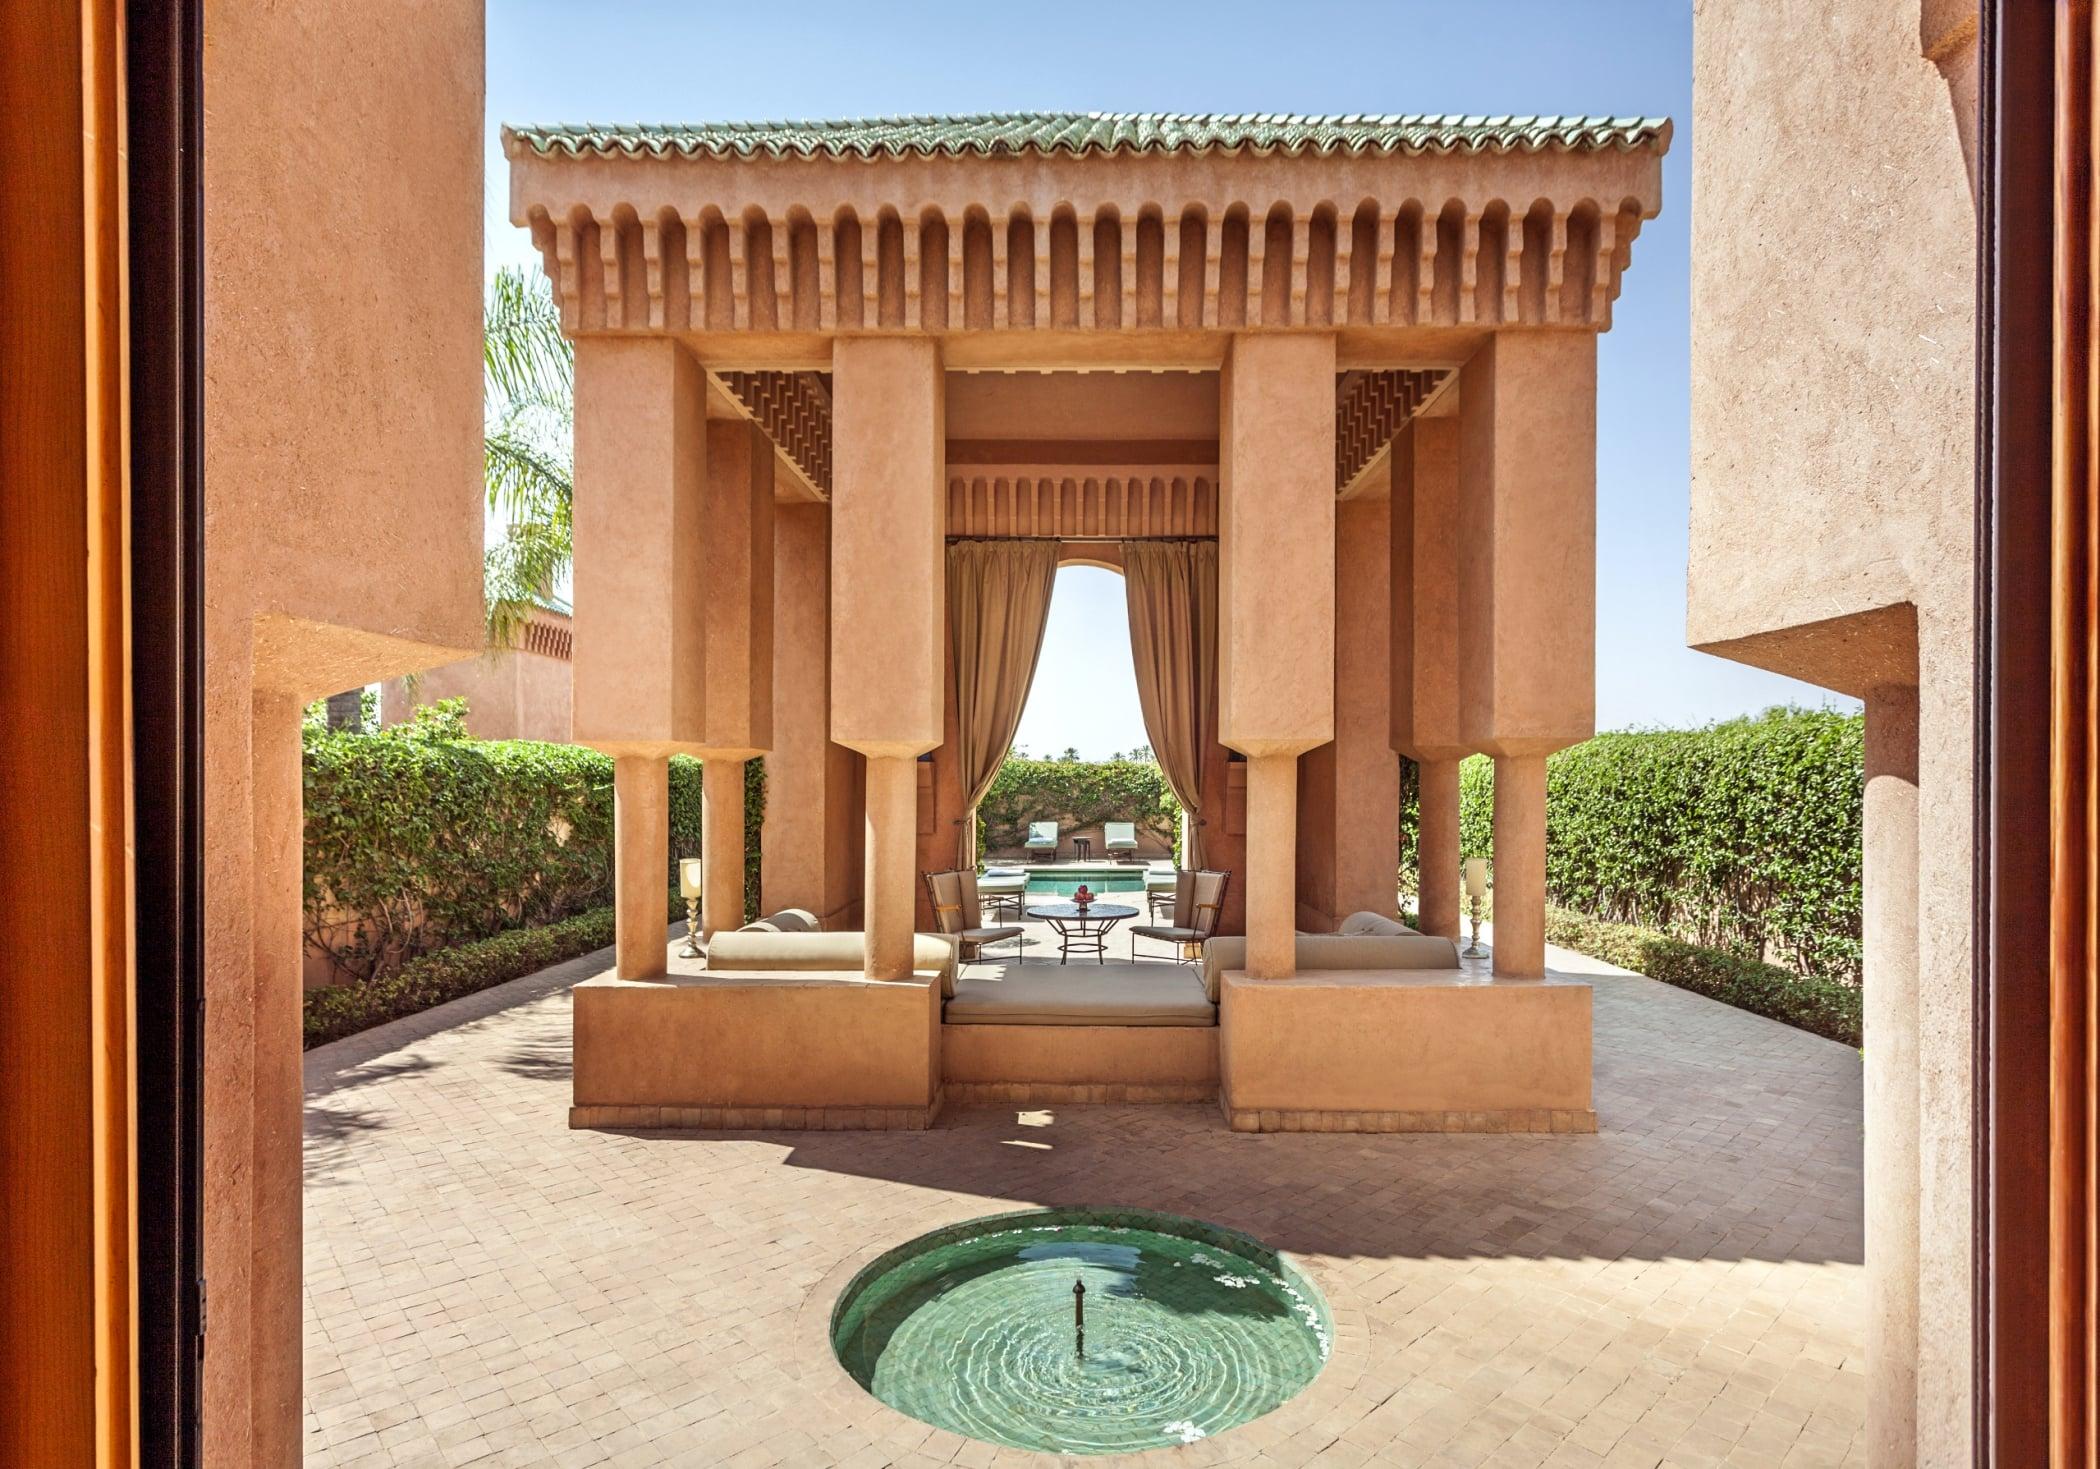 Aman_Amanjena_Morocco_main_gallery_fivestardestination_five_star_destination_43